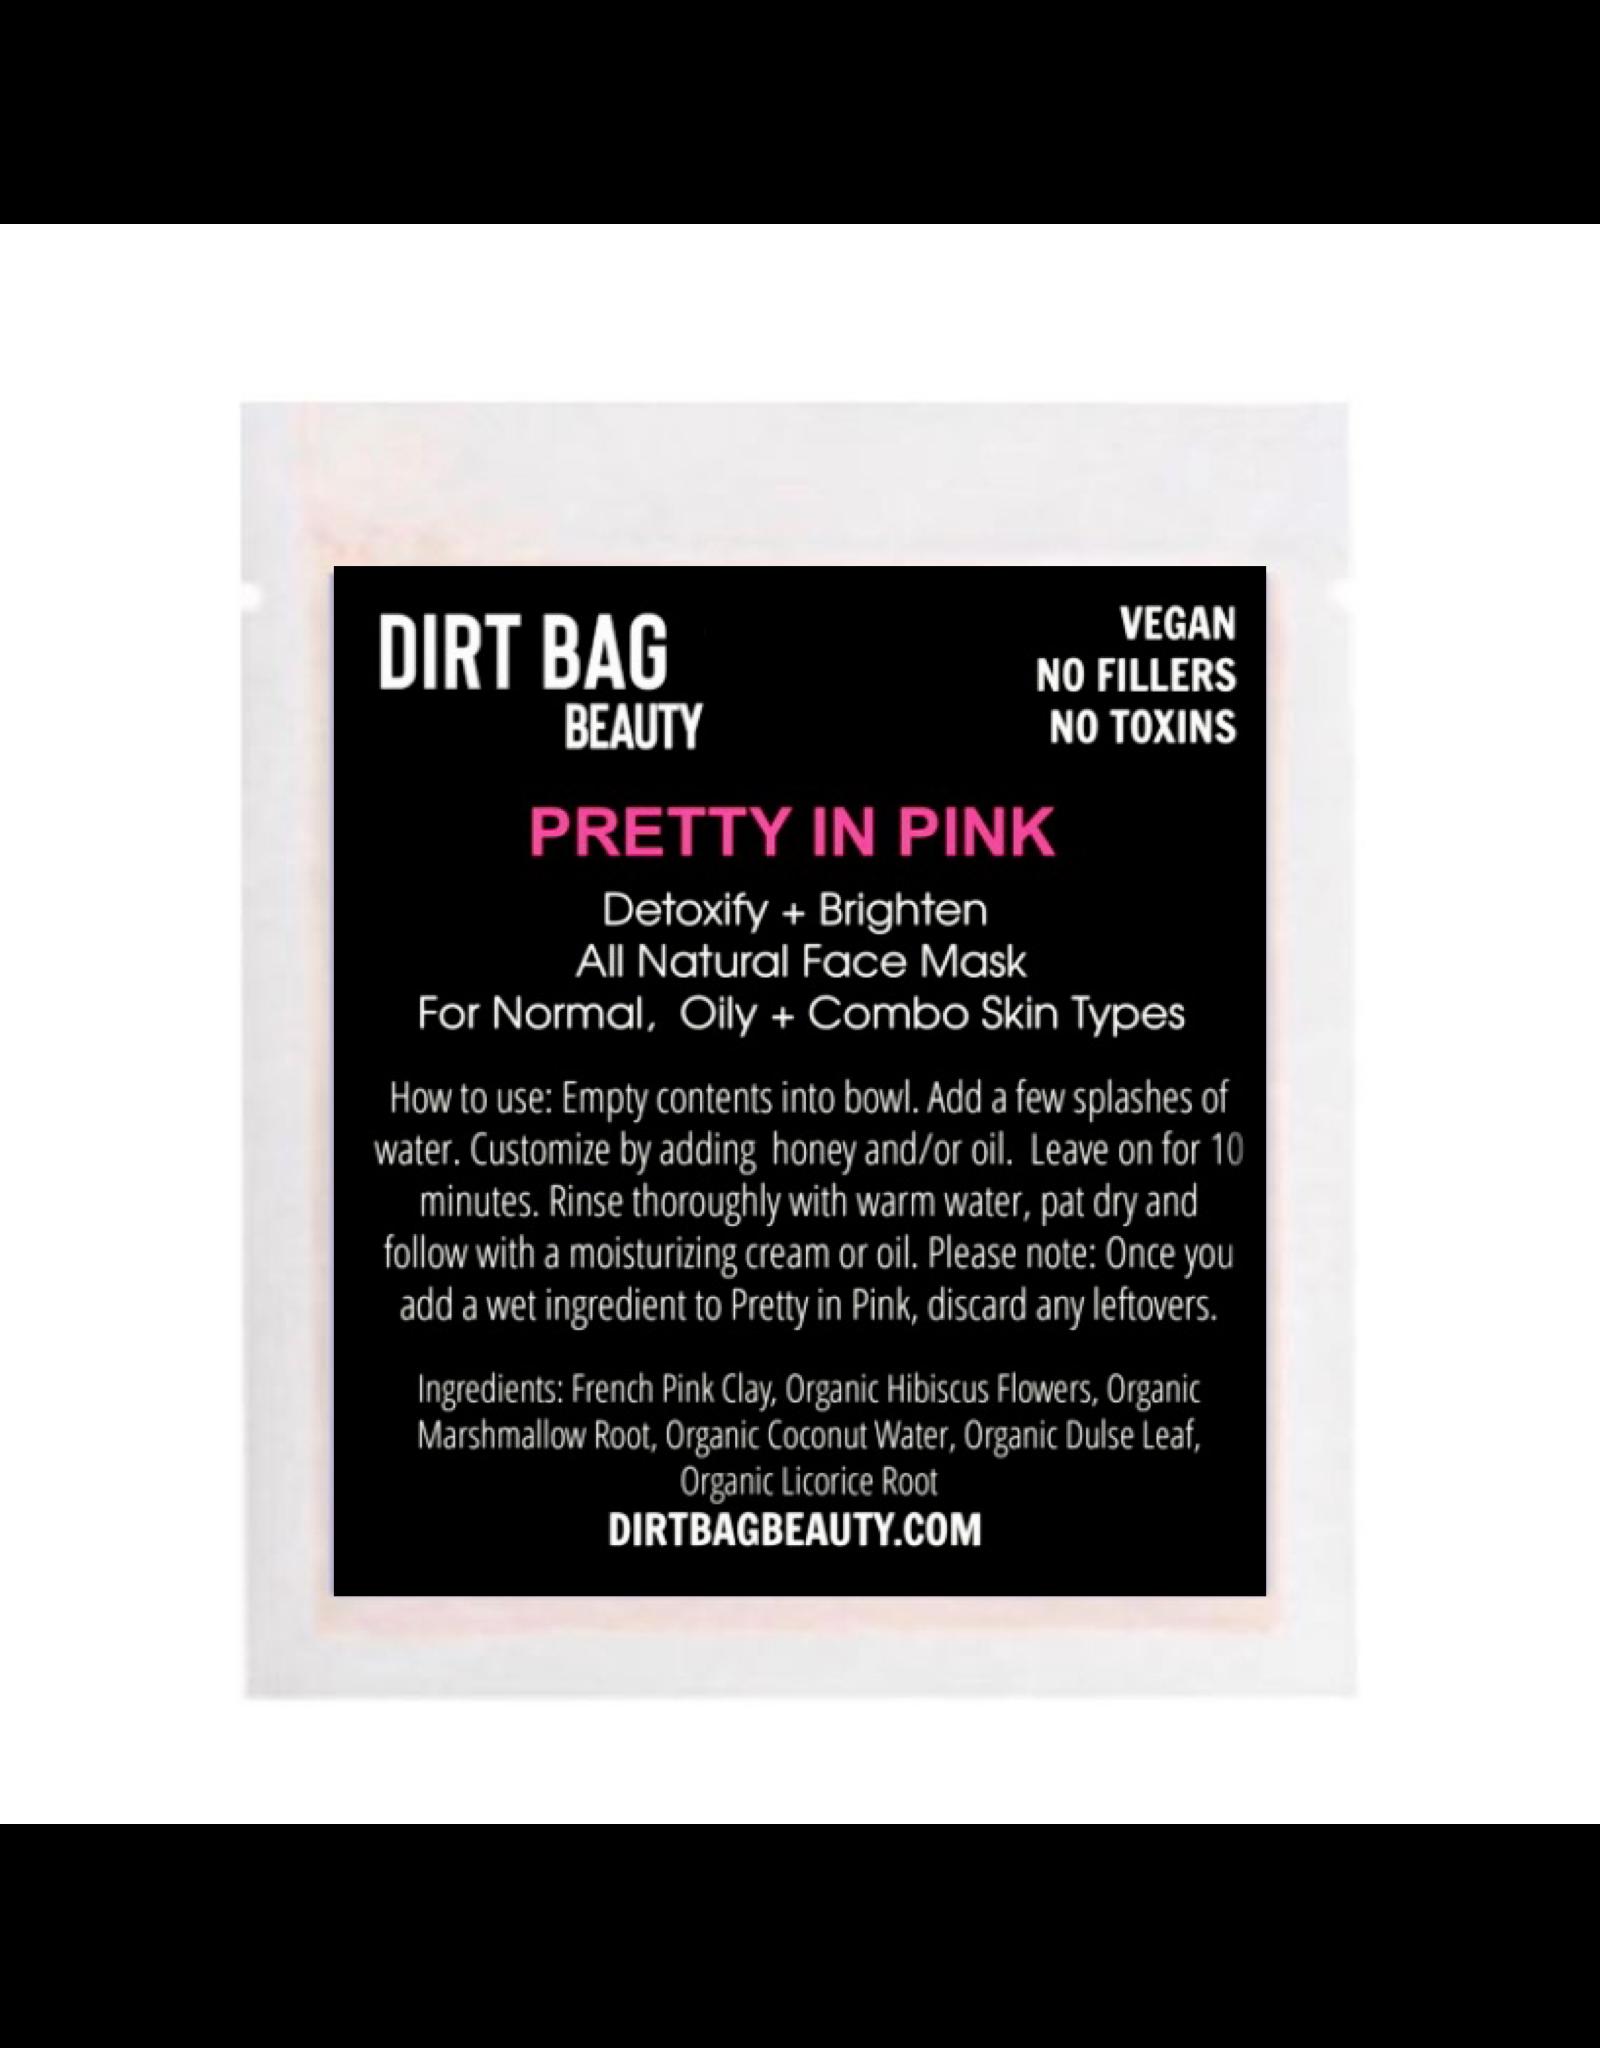 All Natural Vegan Facial Mask - Pretty in Pink